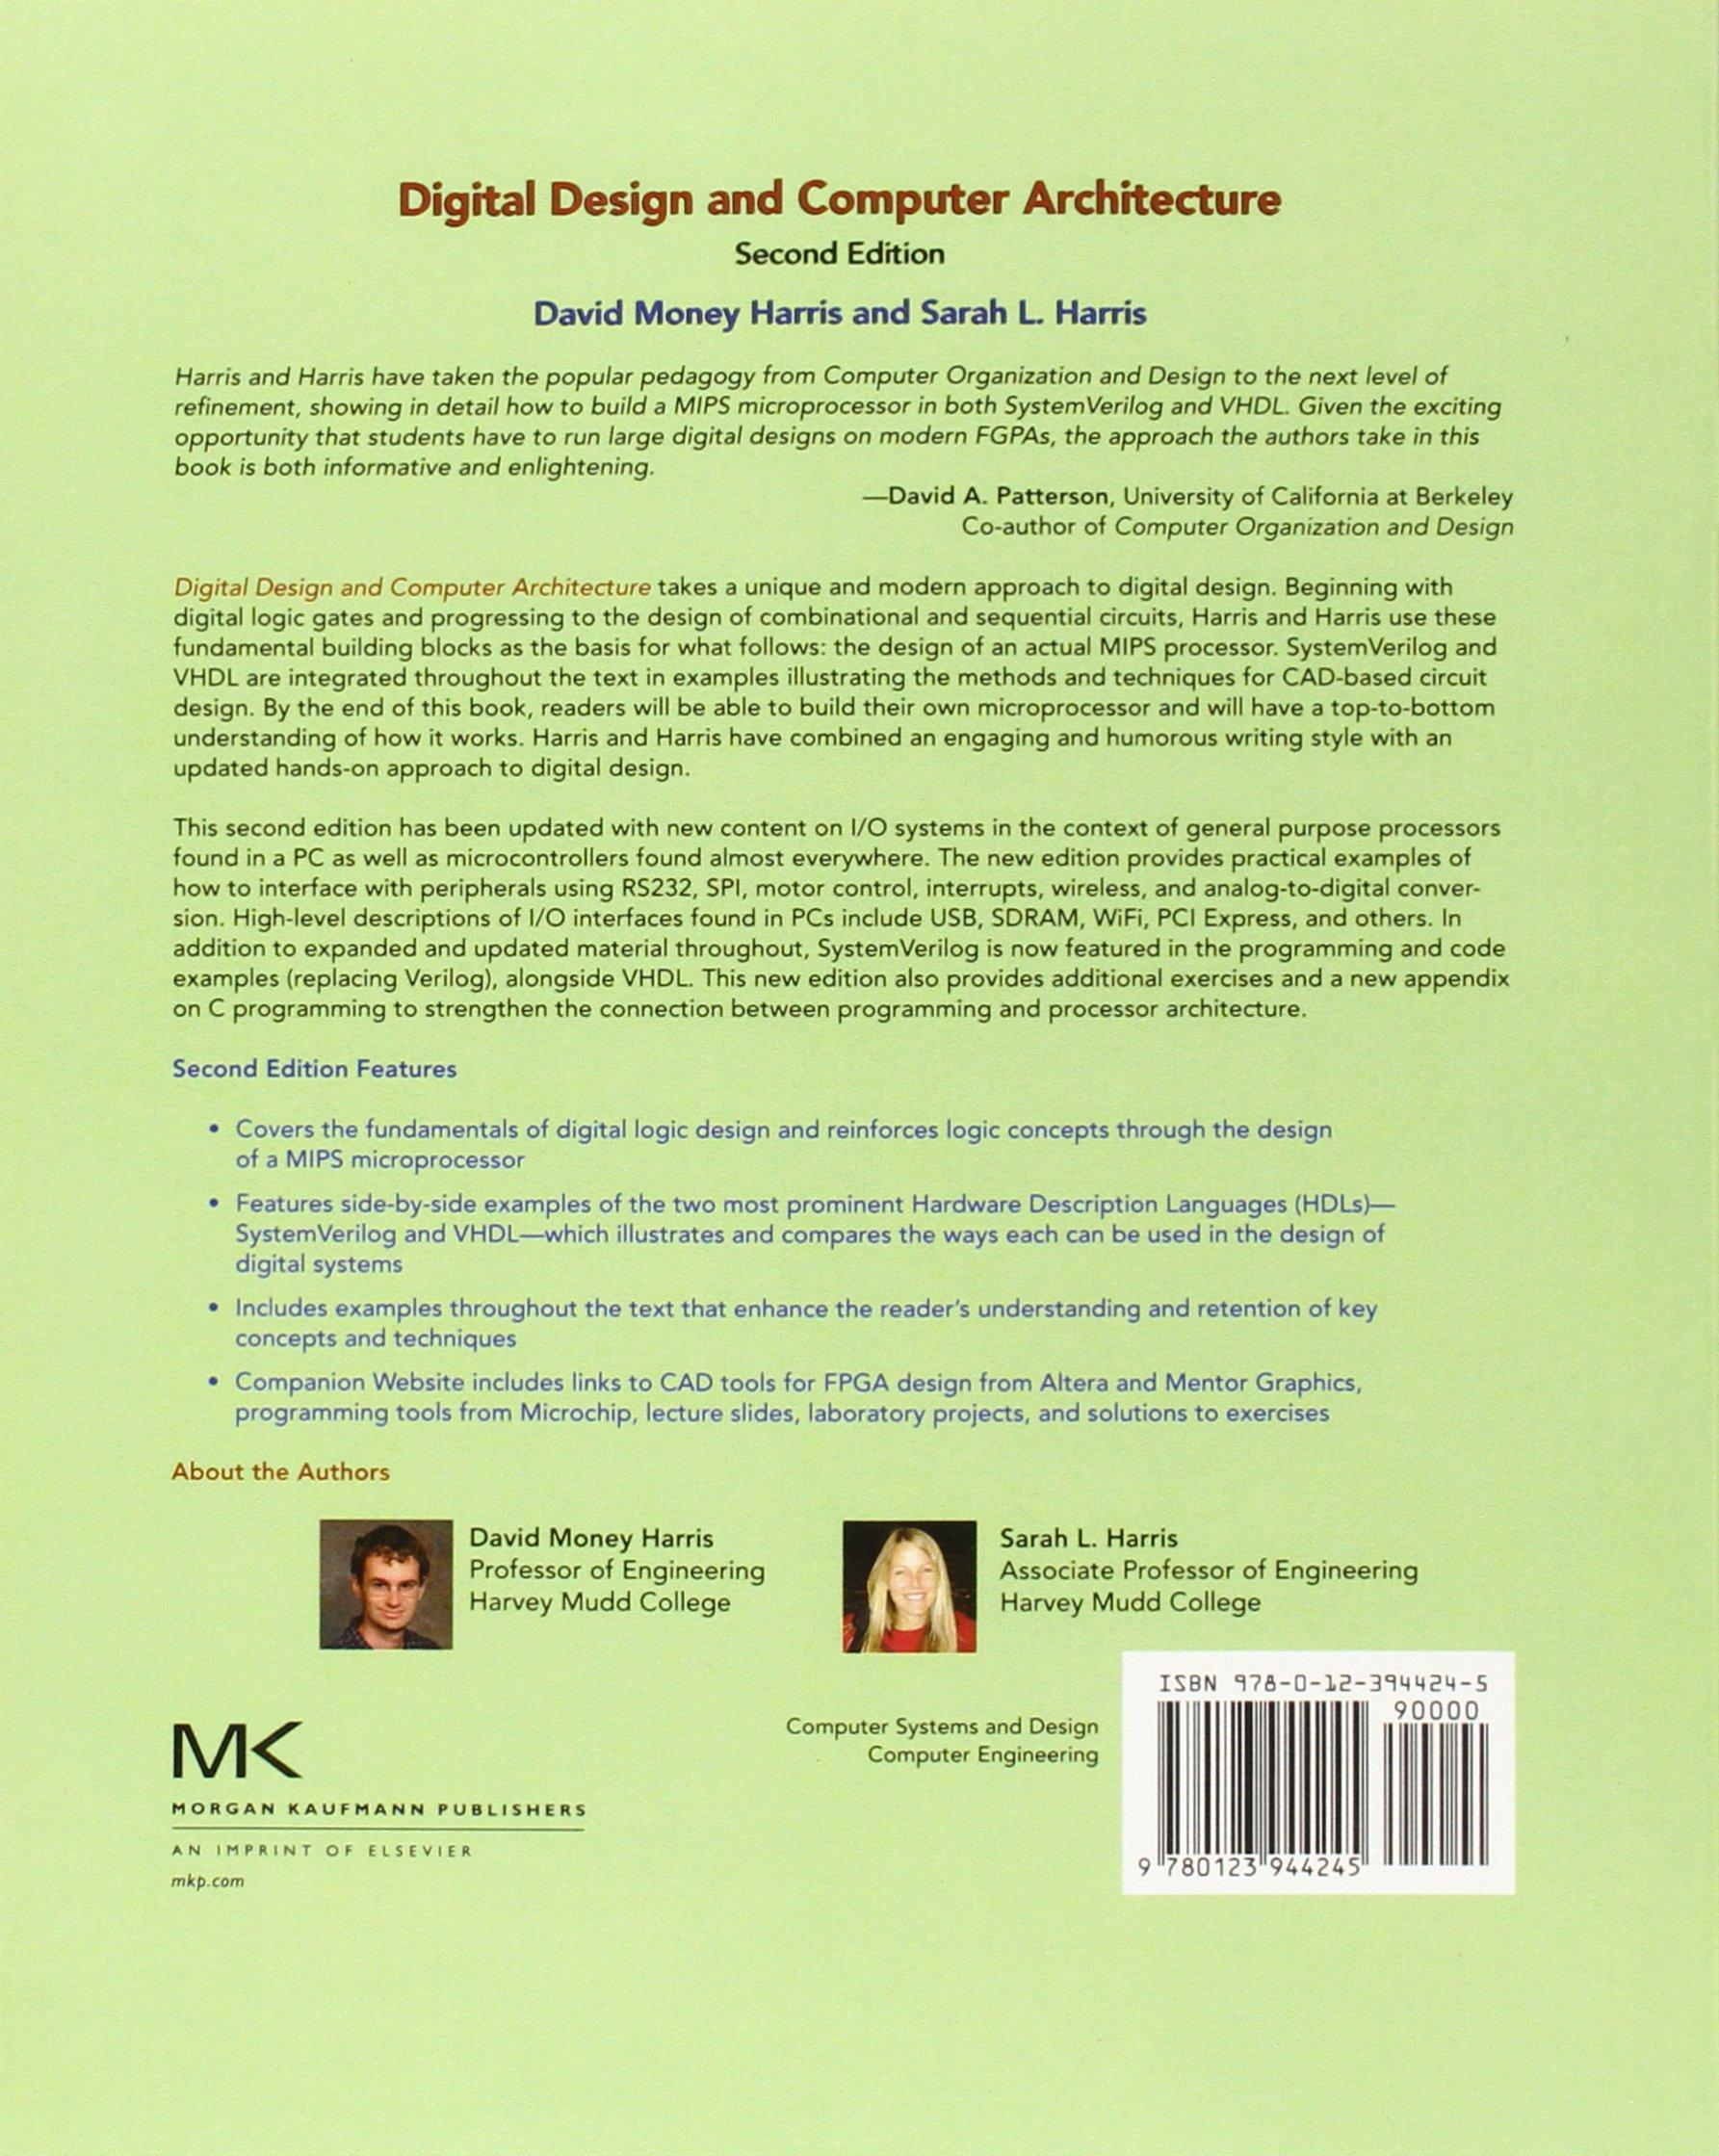 Digital Design And Computer Architecture | Digital Design And Computer Architecture Amazon Co Uk David